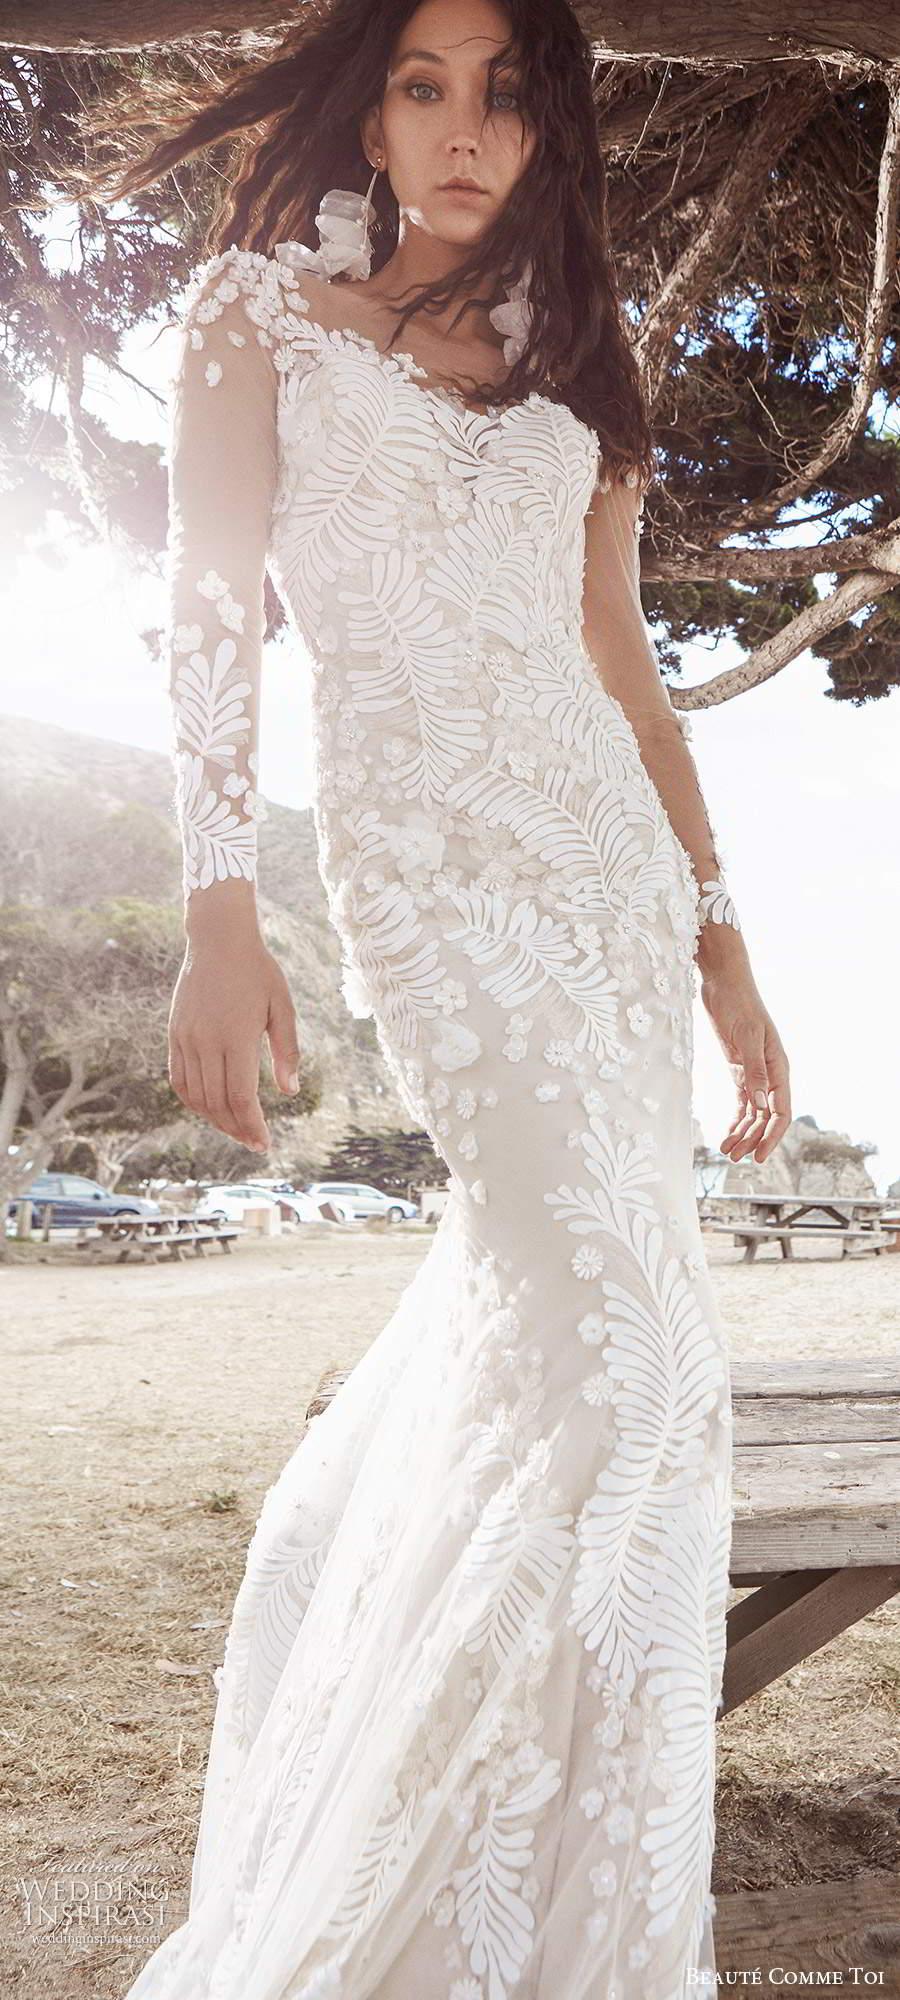 beaute comme toi f2020 bridal long sleeves illusion bateau neckline full embellishment elegant sheath wedding dress backless low back short train (5) mv